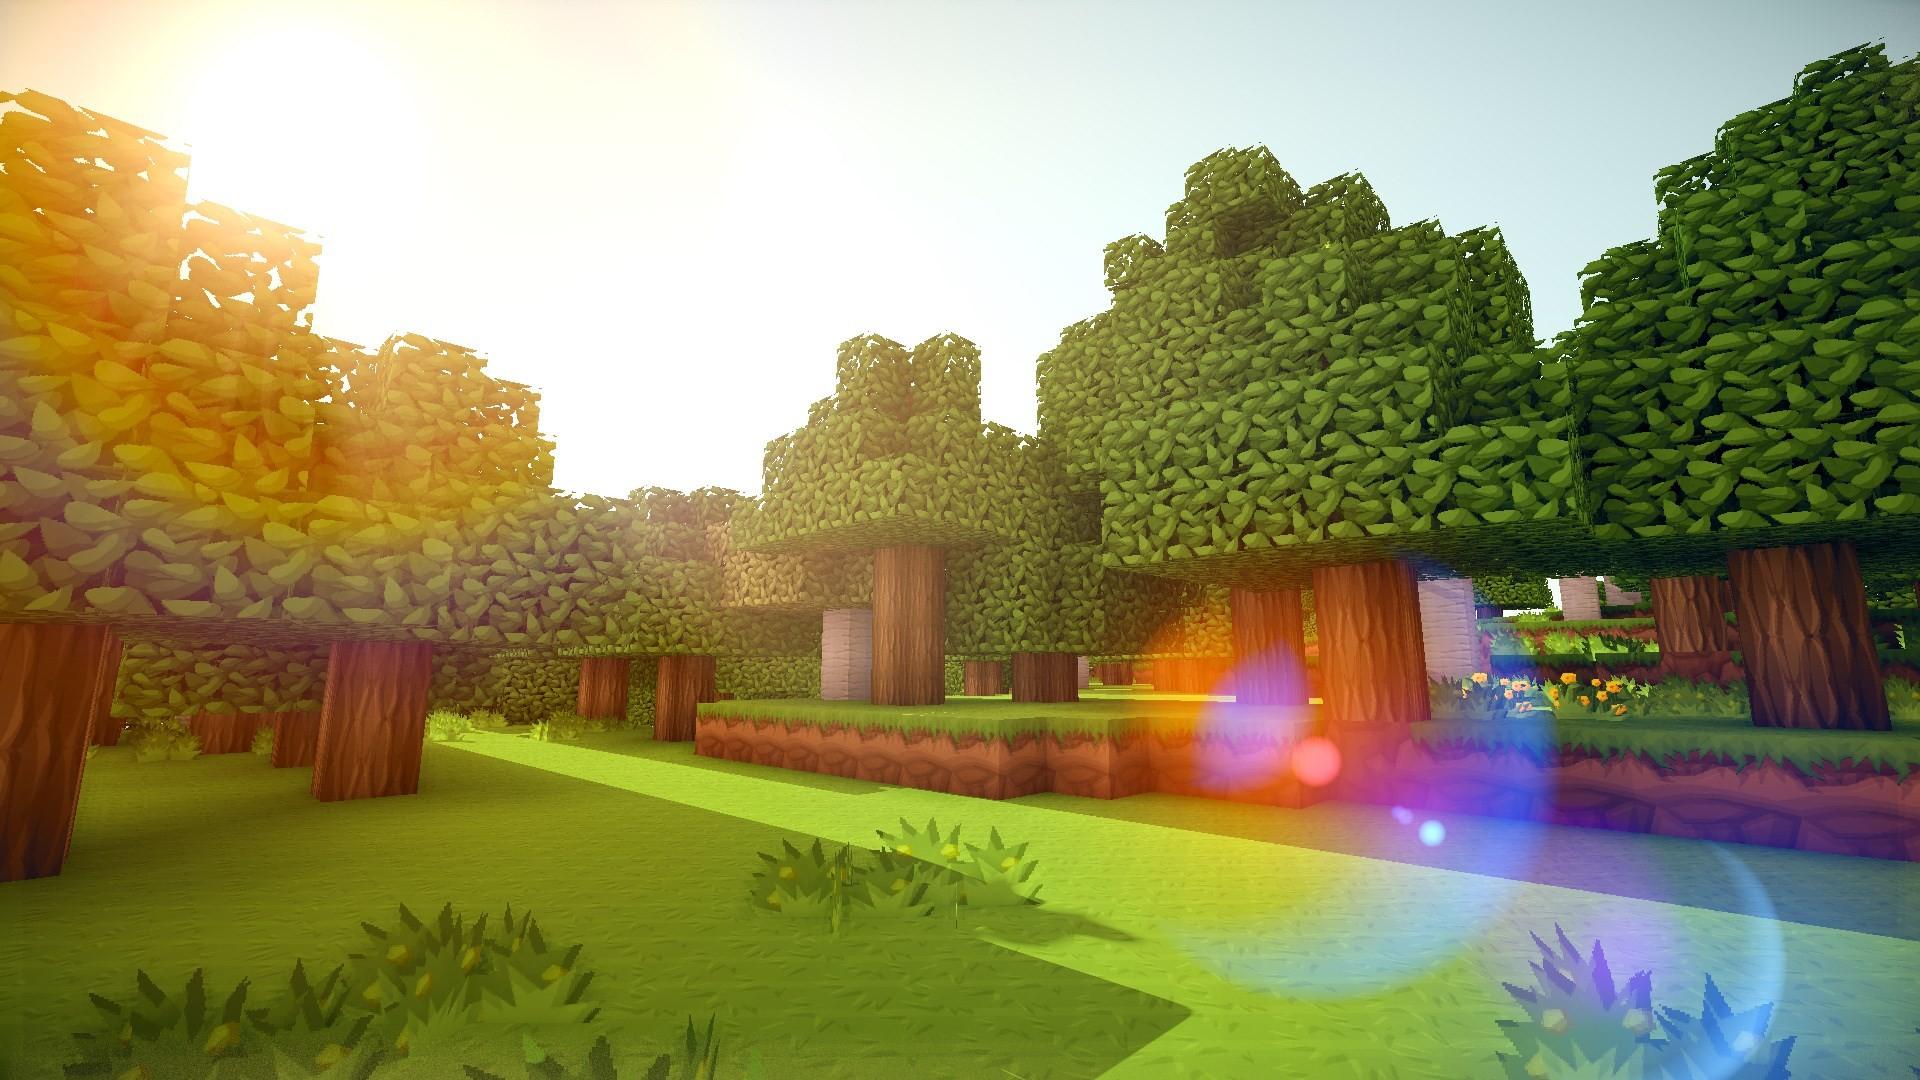 Cool Wallpaper Minecraft Gamer - 960394-beautiful-minecraft-computer-wallpaper-1920x1080-for-iphone-5s  Image_486535.jpg